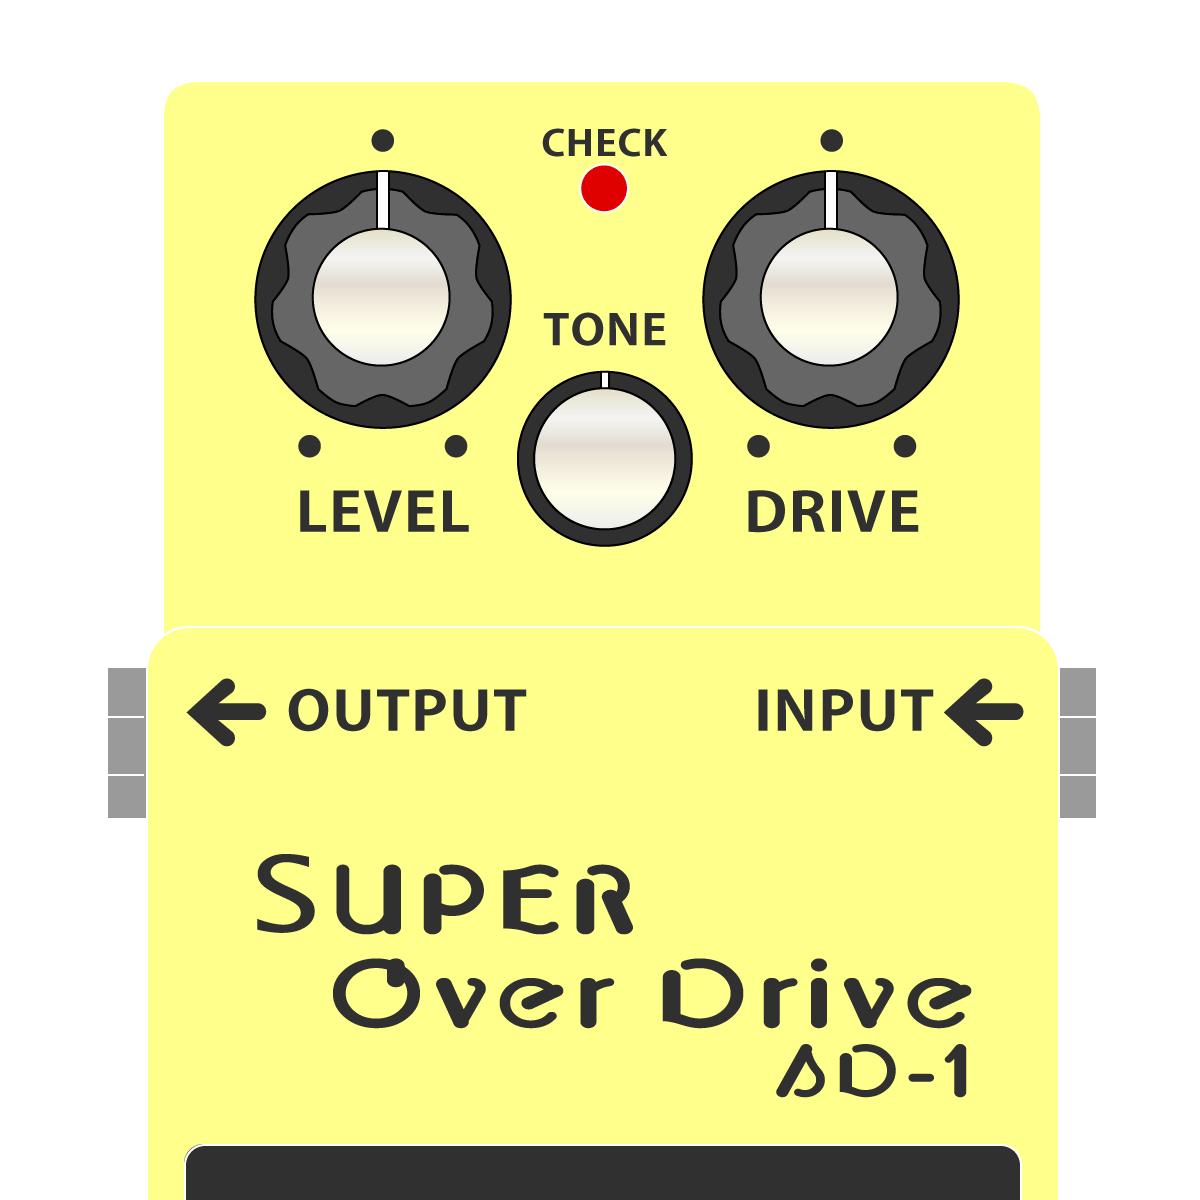 SD-1 SUPER OverDrive(スーパーオーバードライブ)